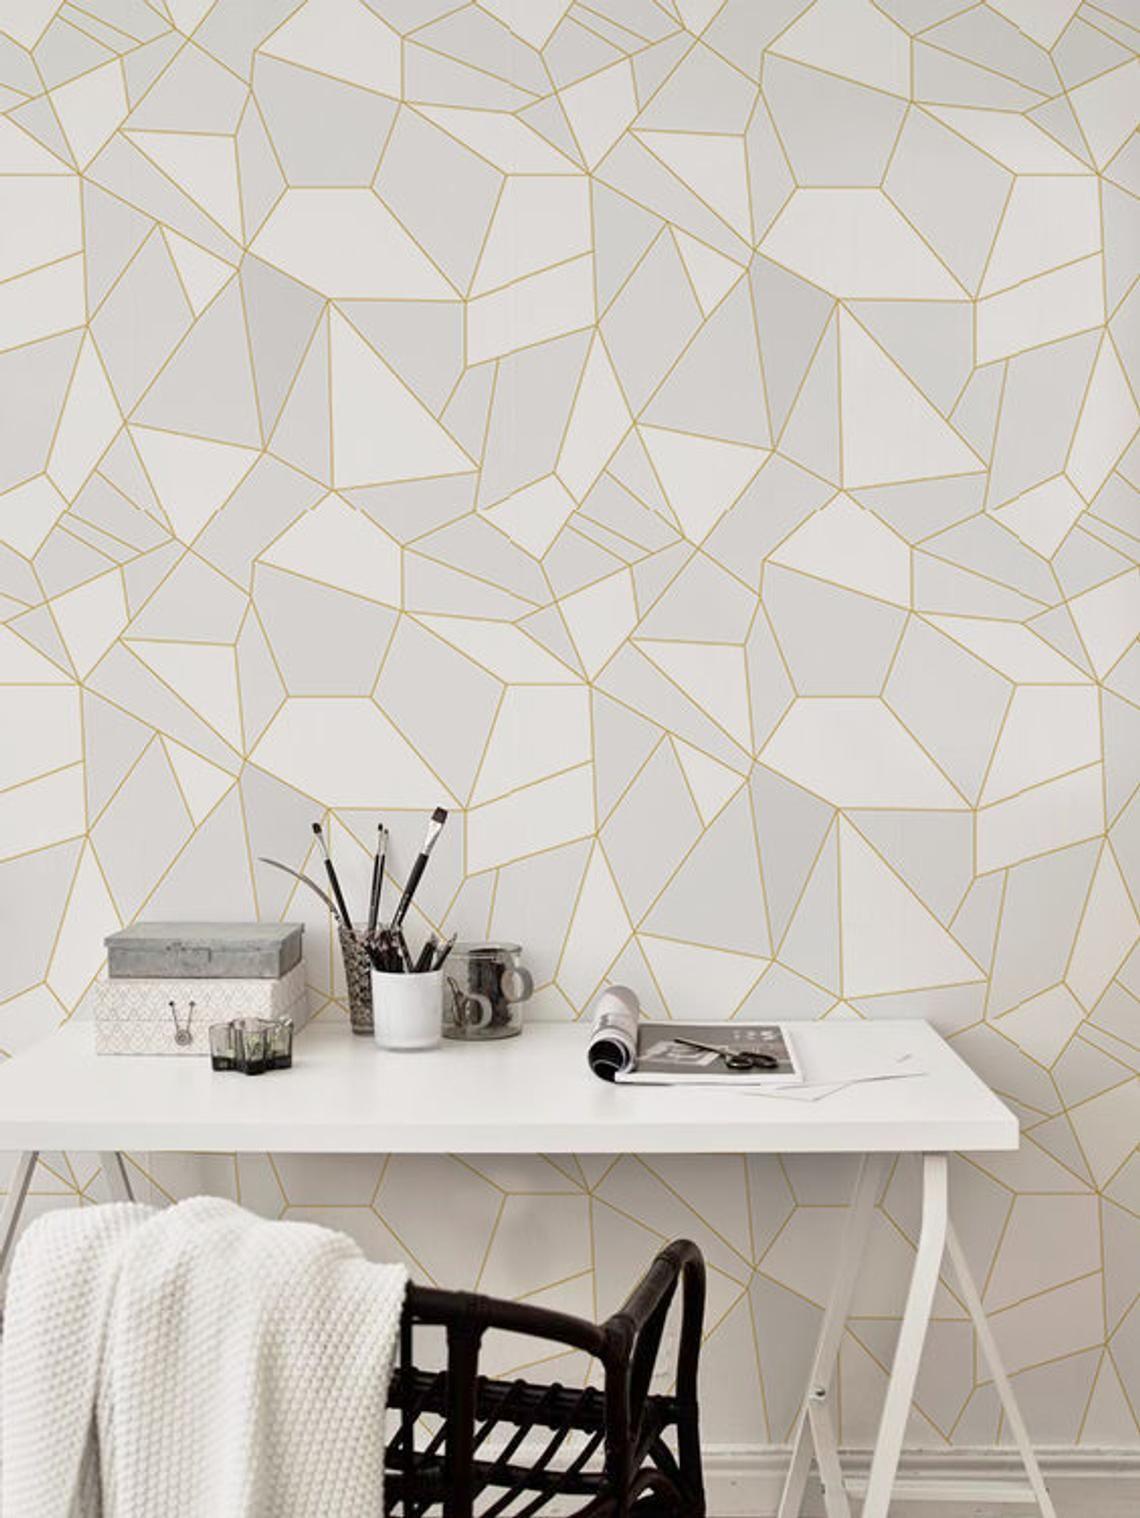 Light Triangles Removable Wallpaper Light Grey Wall Mural Etsy Light Grey Walls Removable Wallpaper Grey Walls Bedroom wallpaper light grey